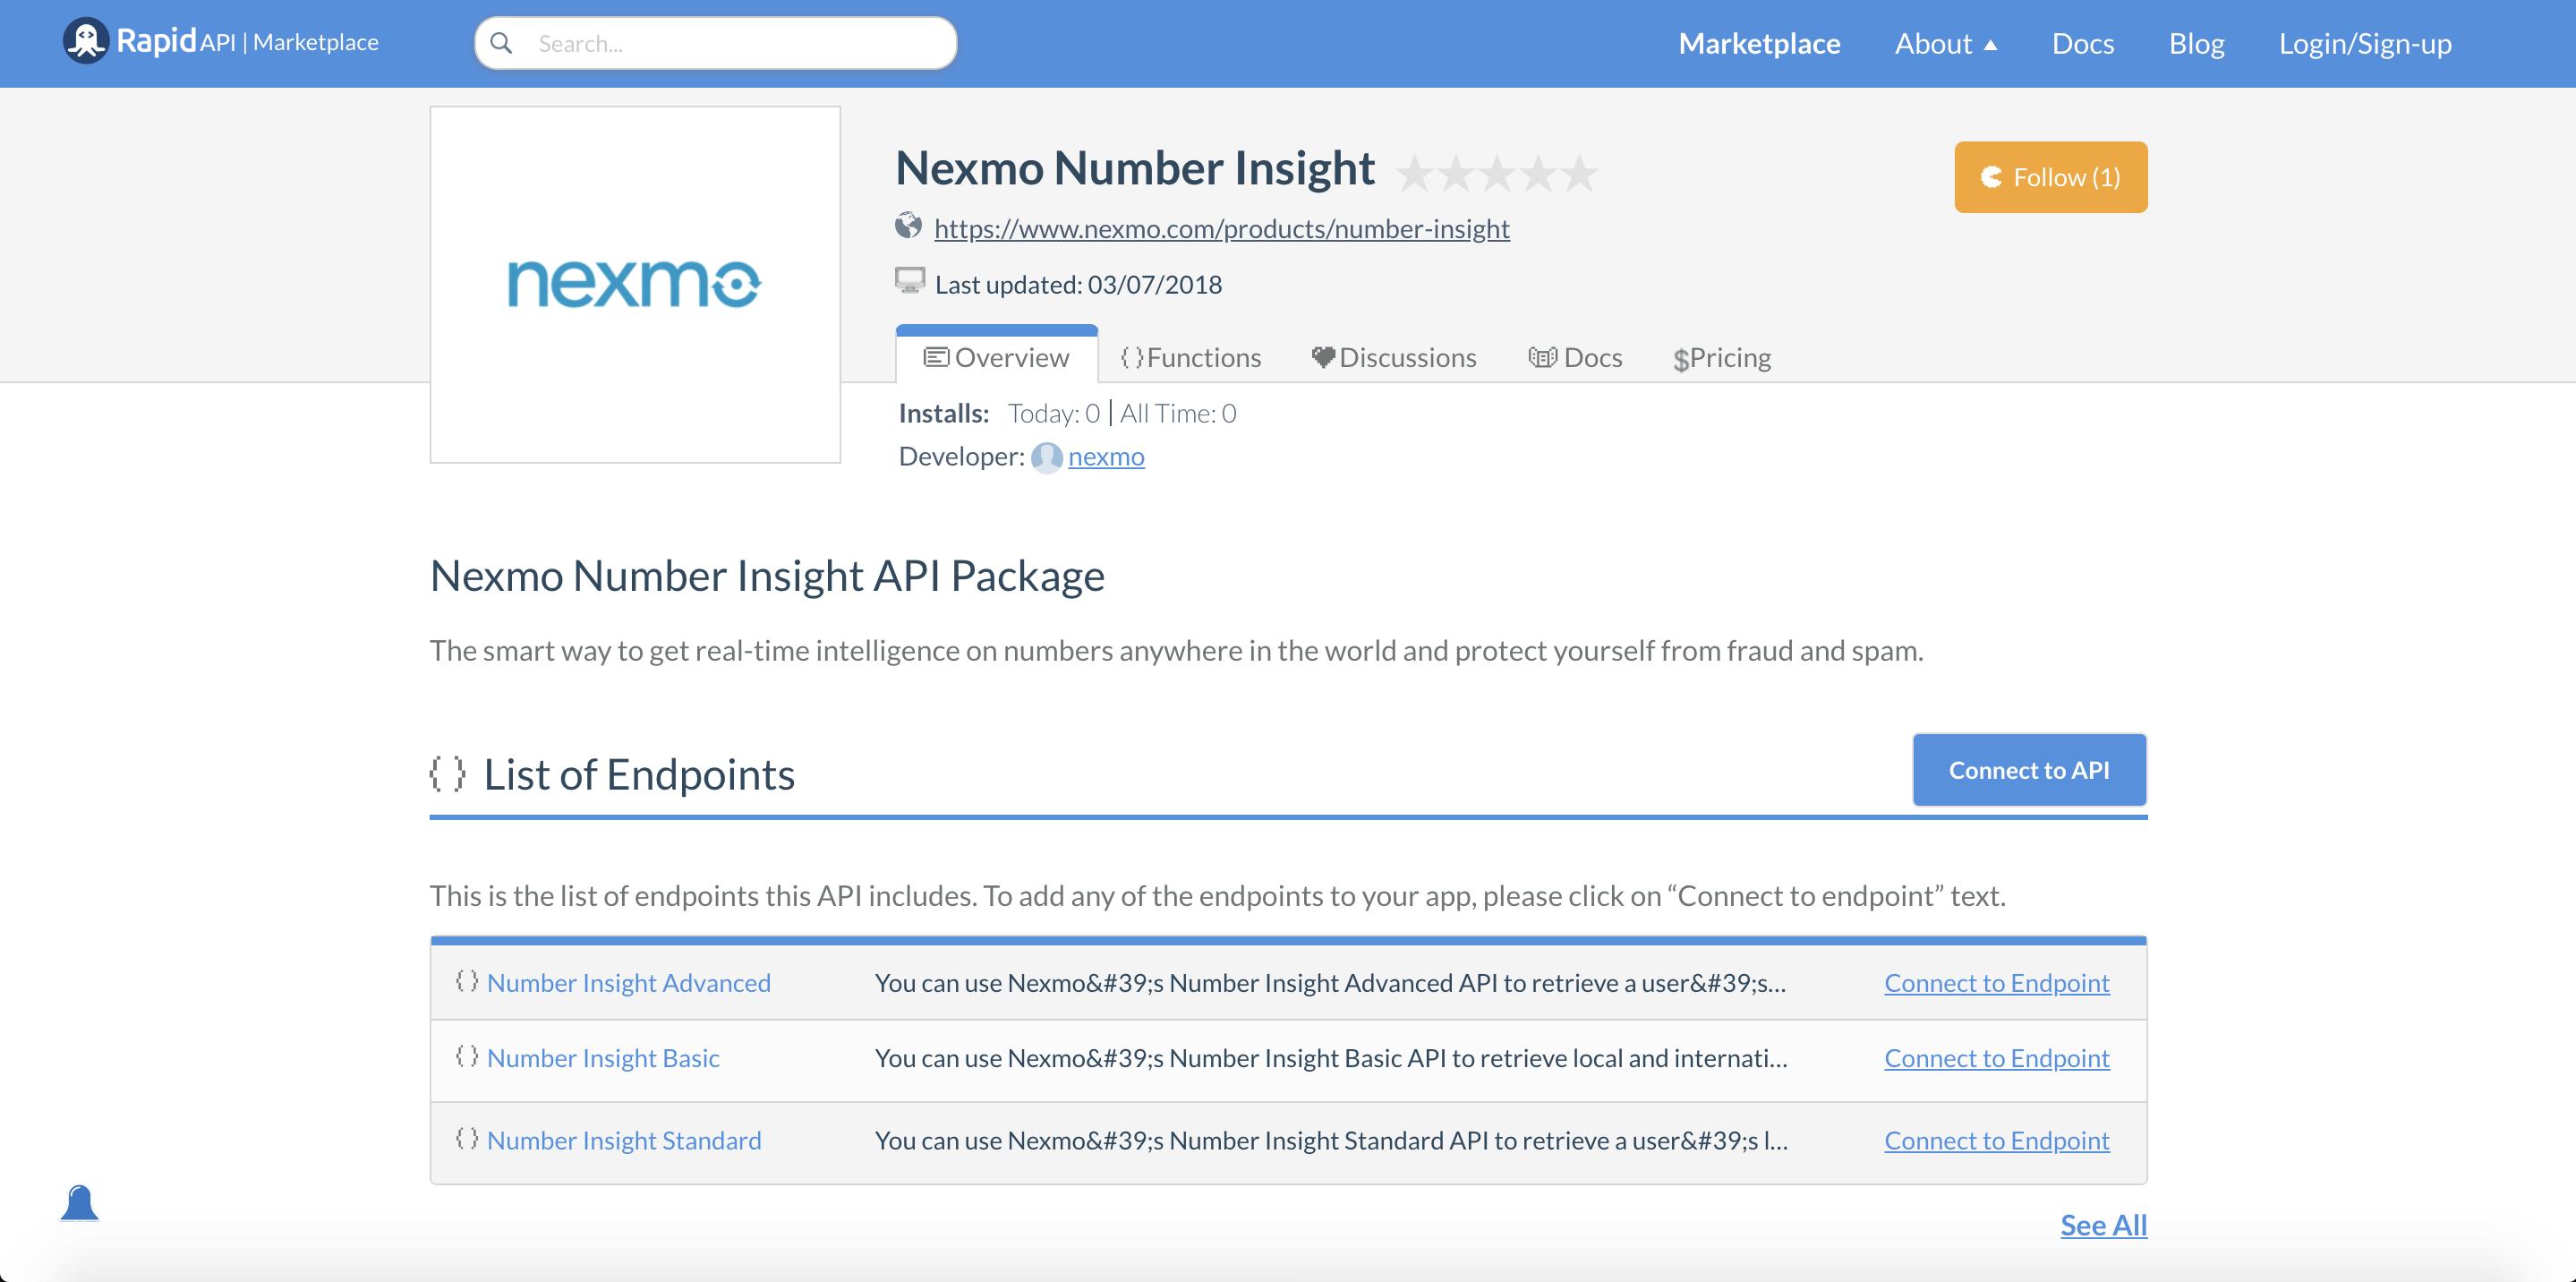 Nexmo Number Insight API listed on RapidAPI